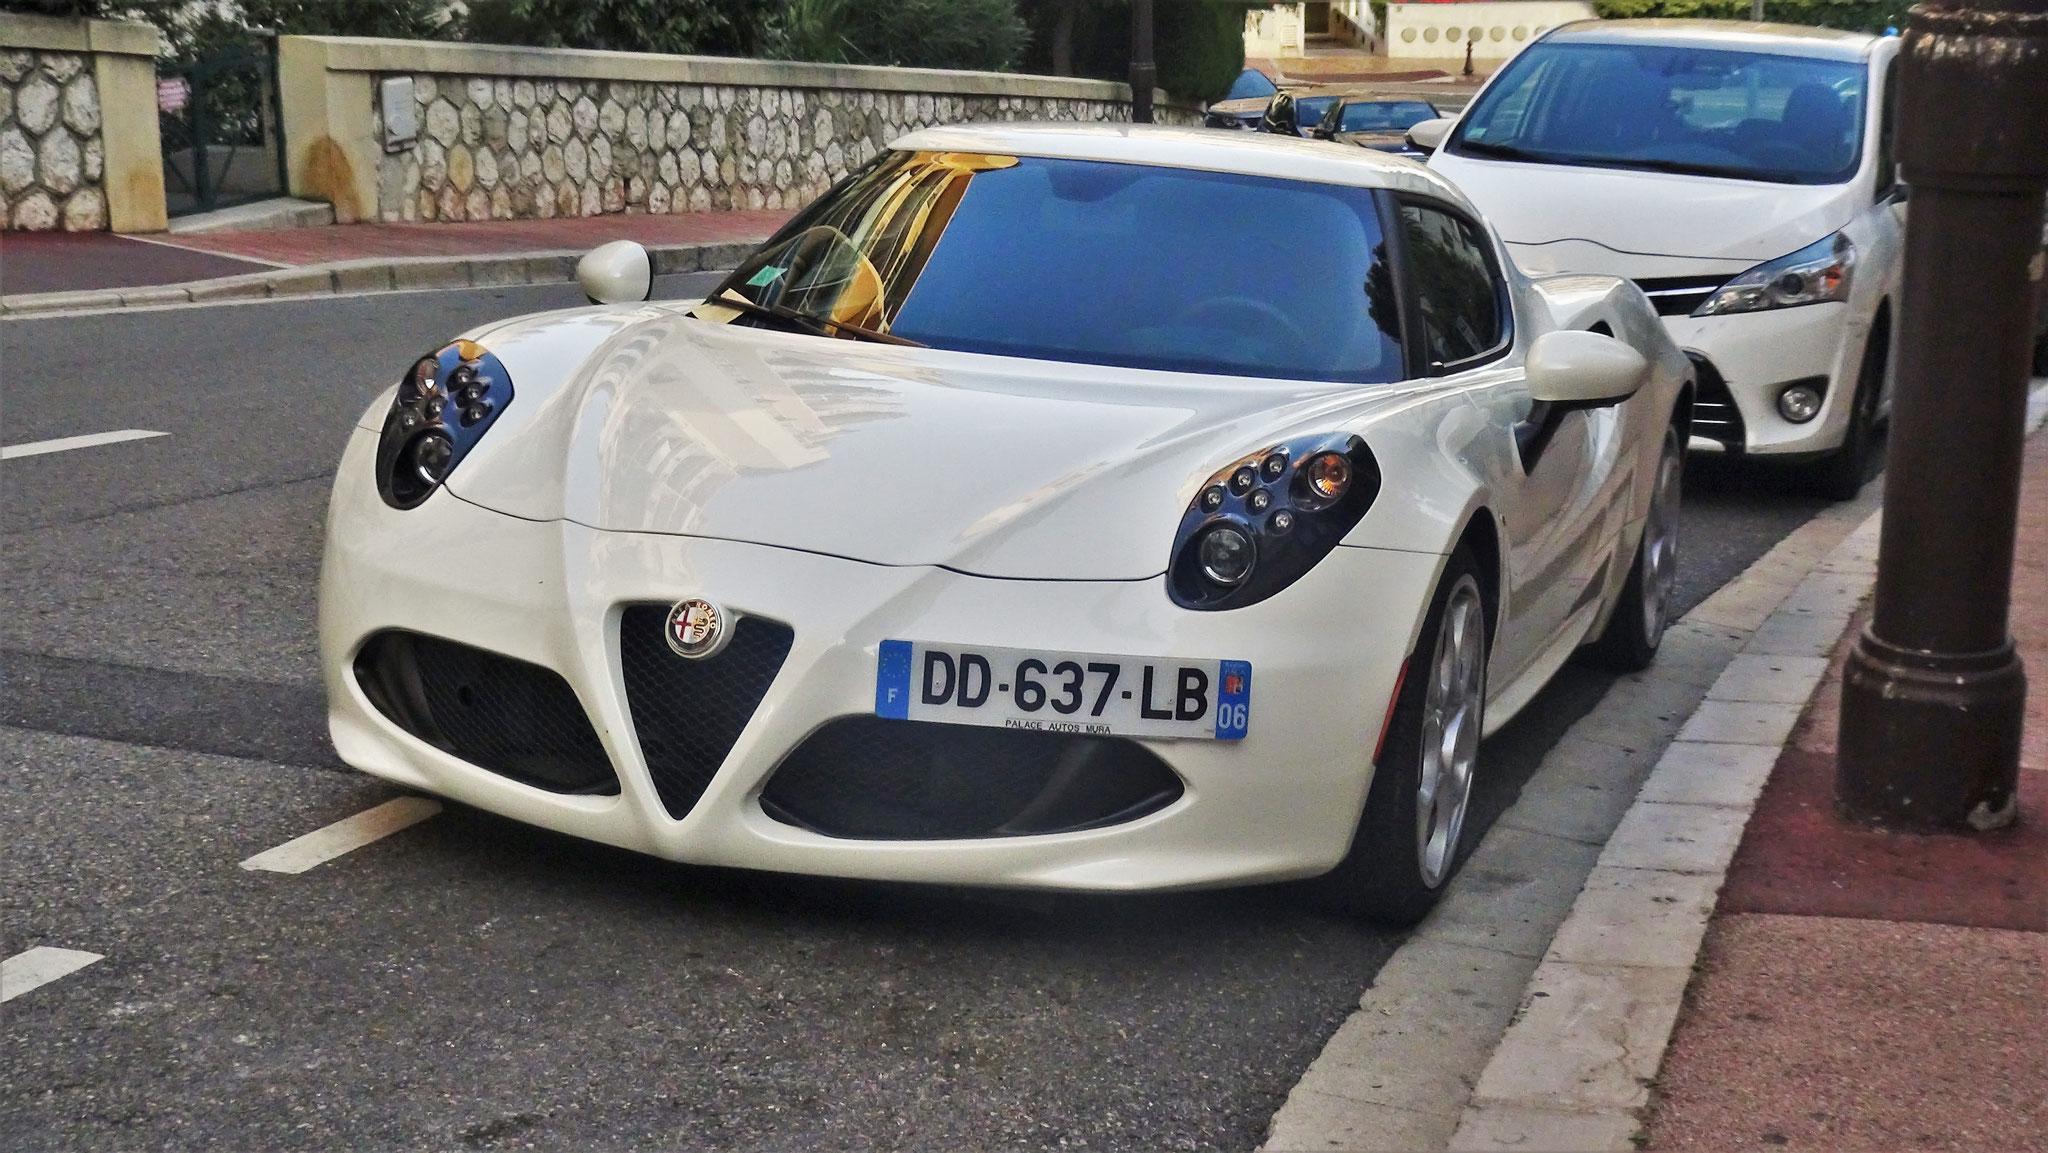 Alfa Romeo 4C - DD-637-LB-06 (FRA)